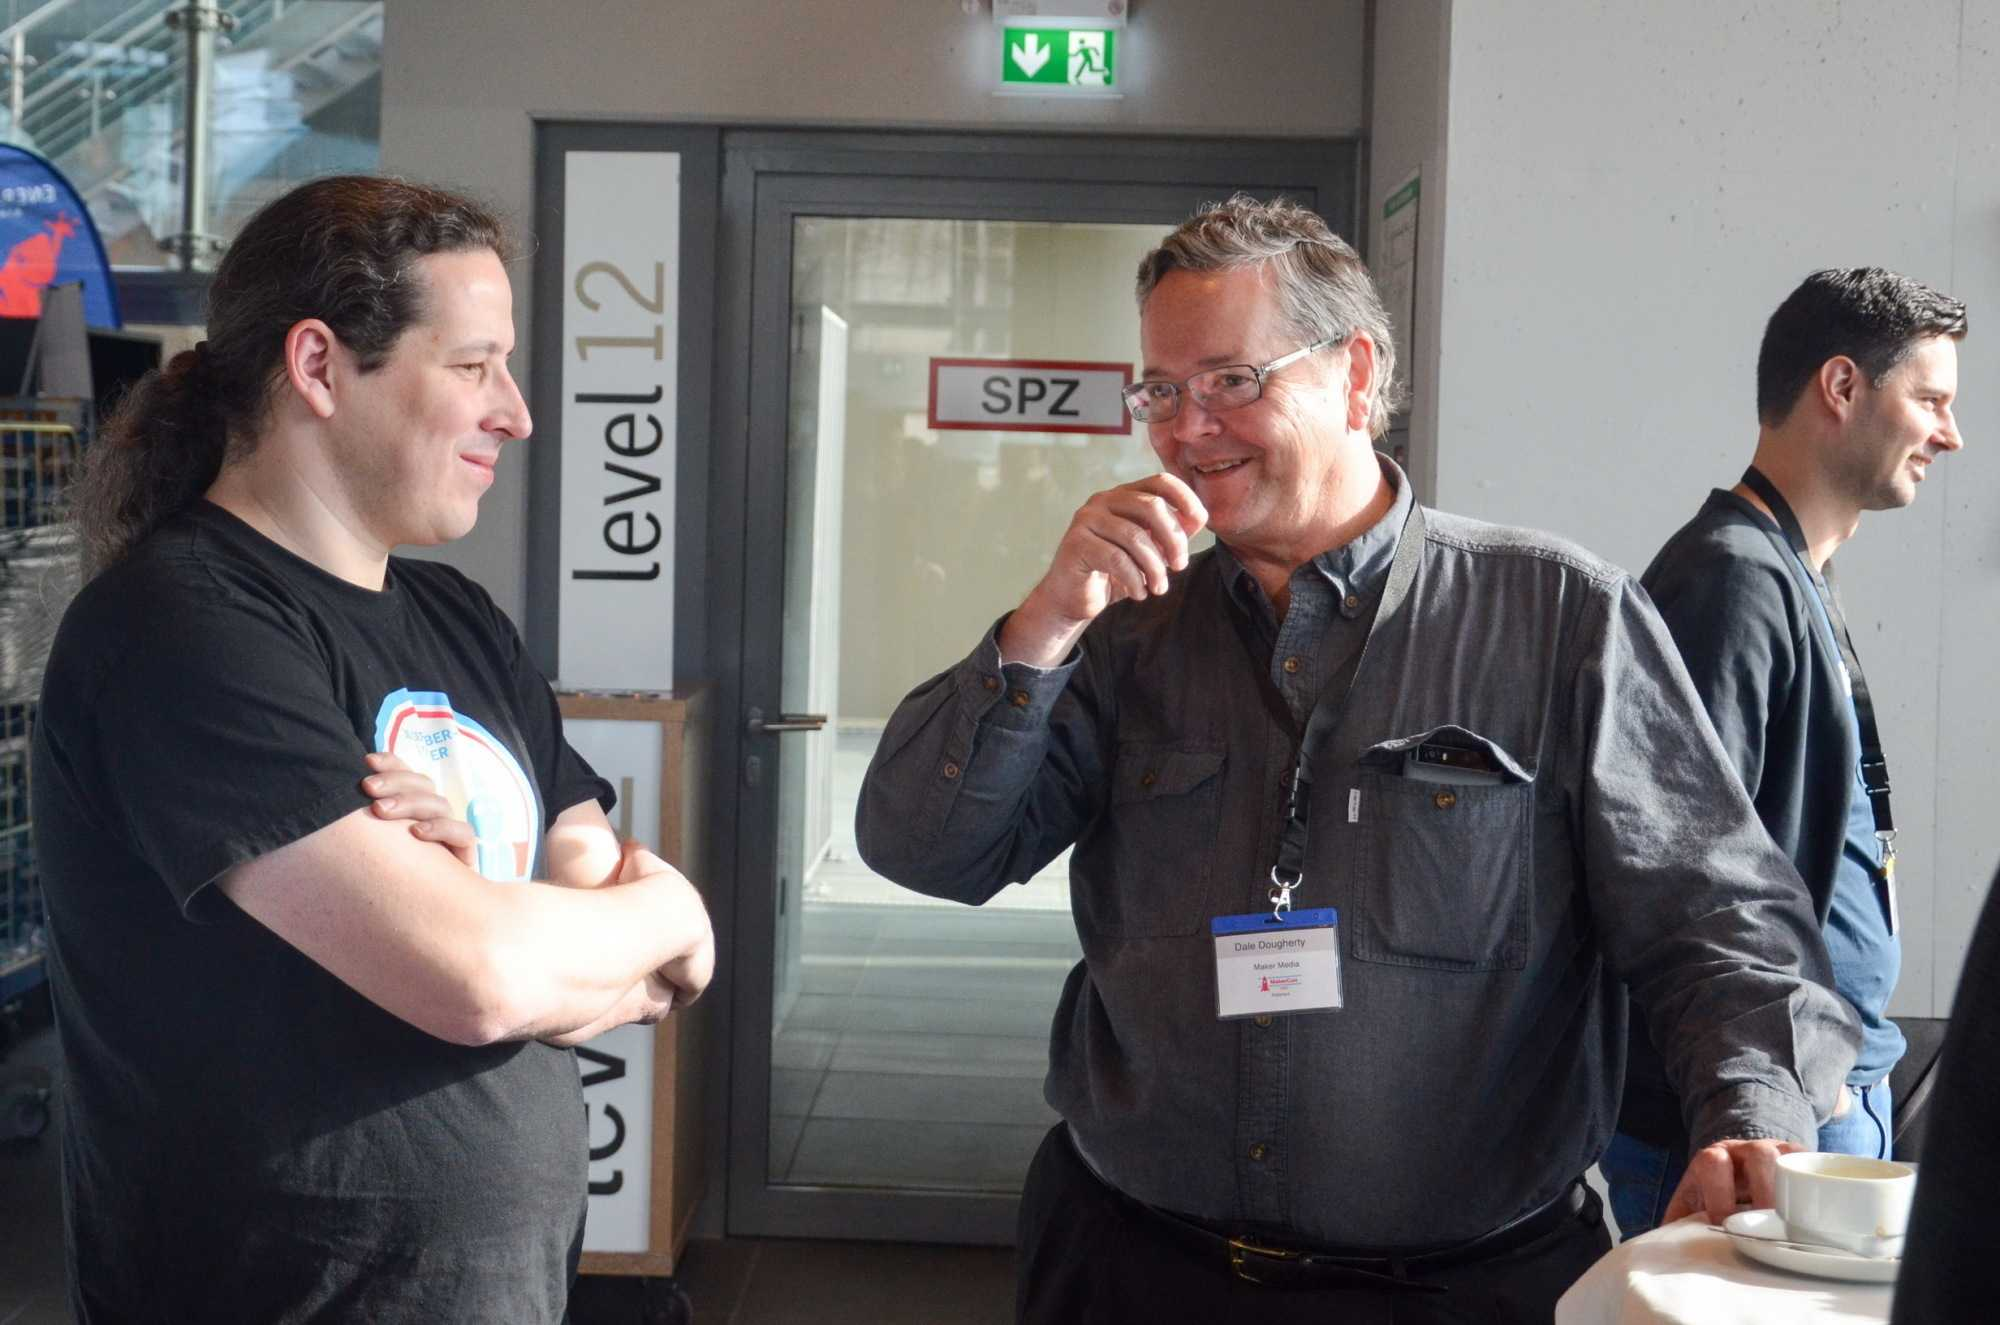 Angeregter Dialog der beiden Keynotesprecher Mario Lukas und Dale Dougherty